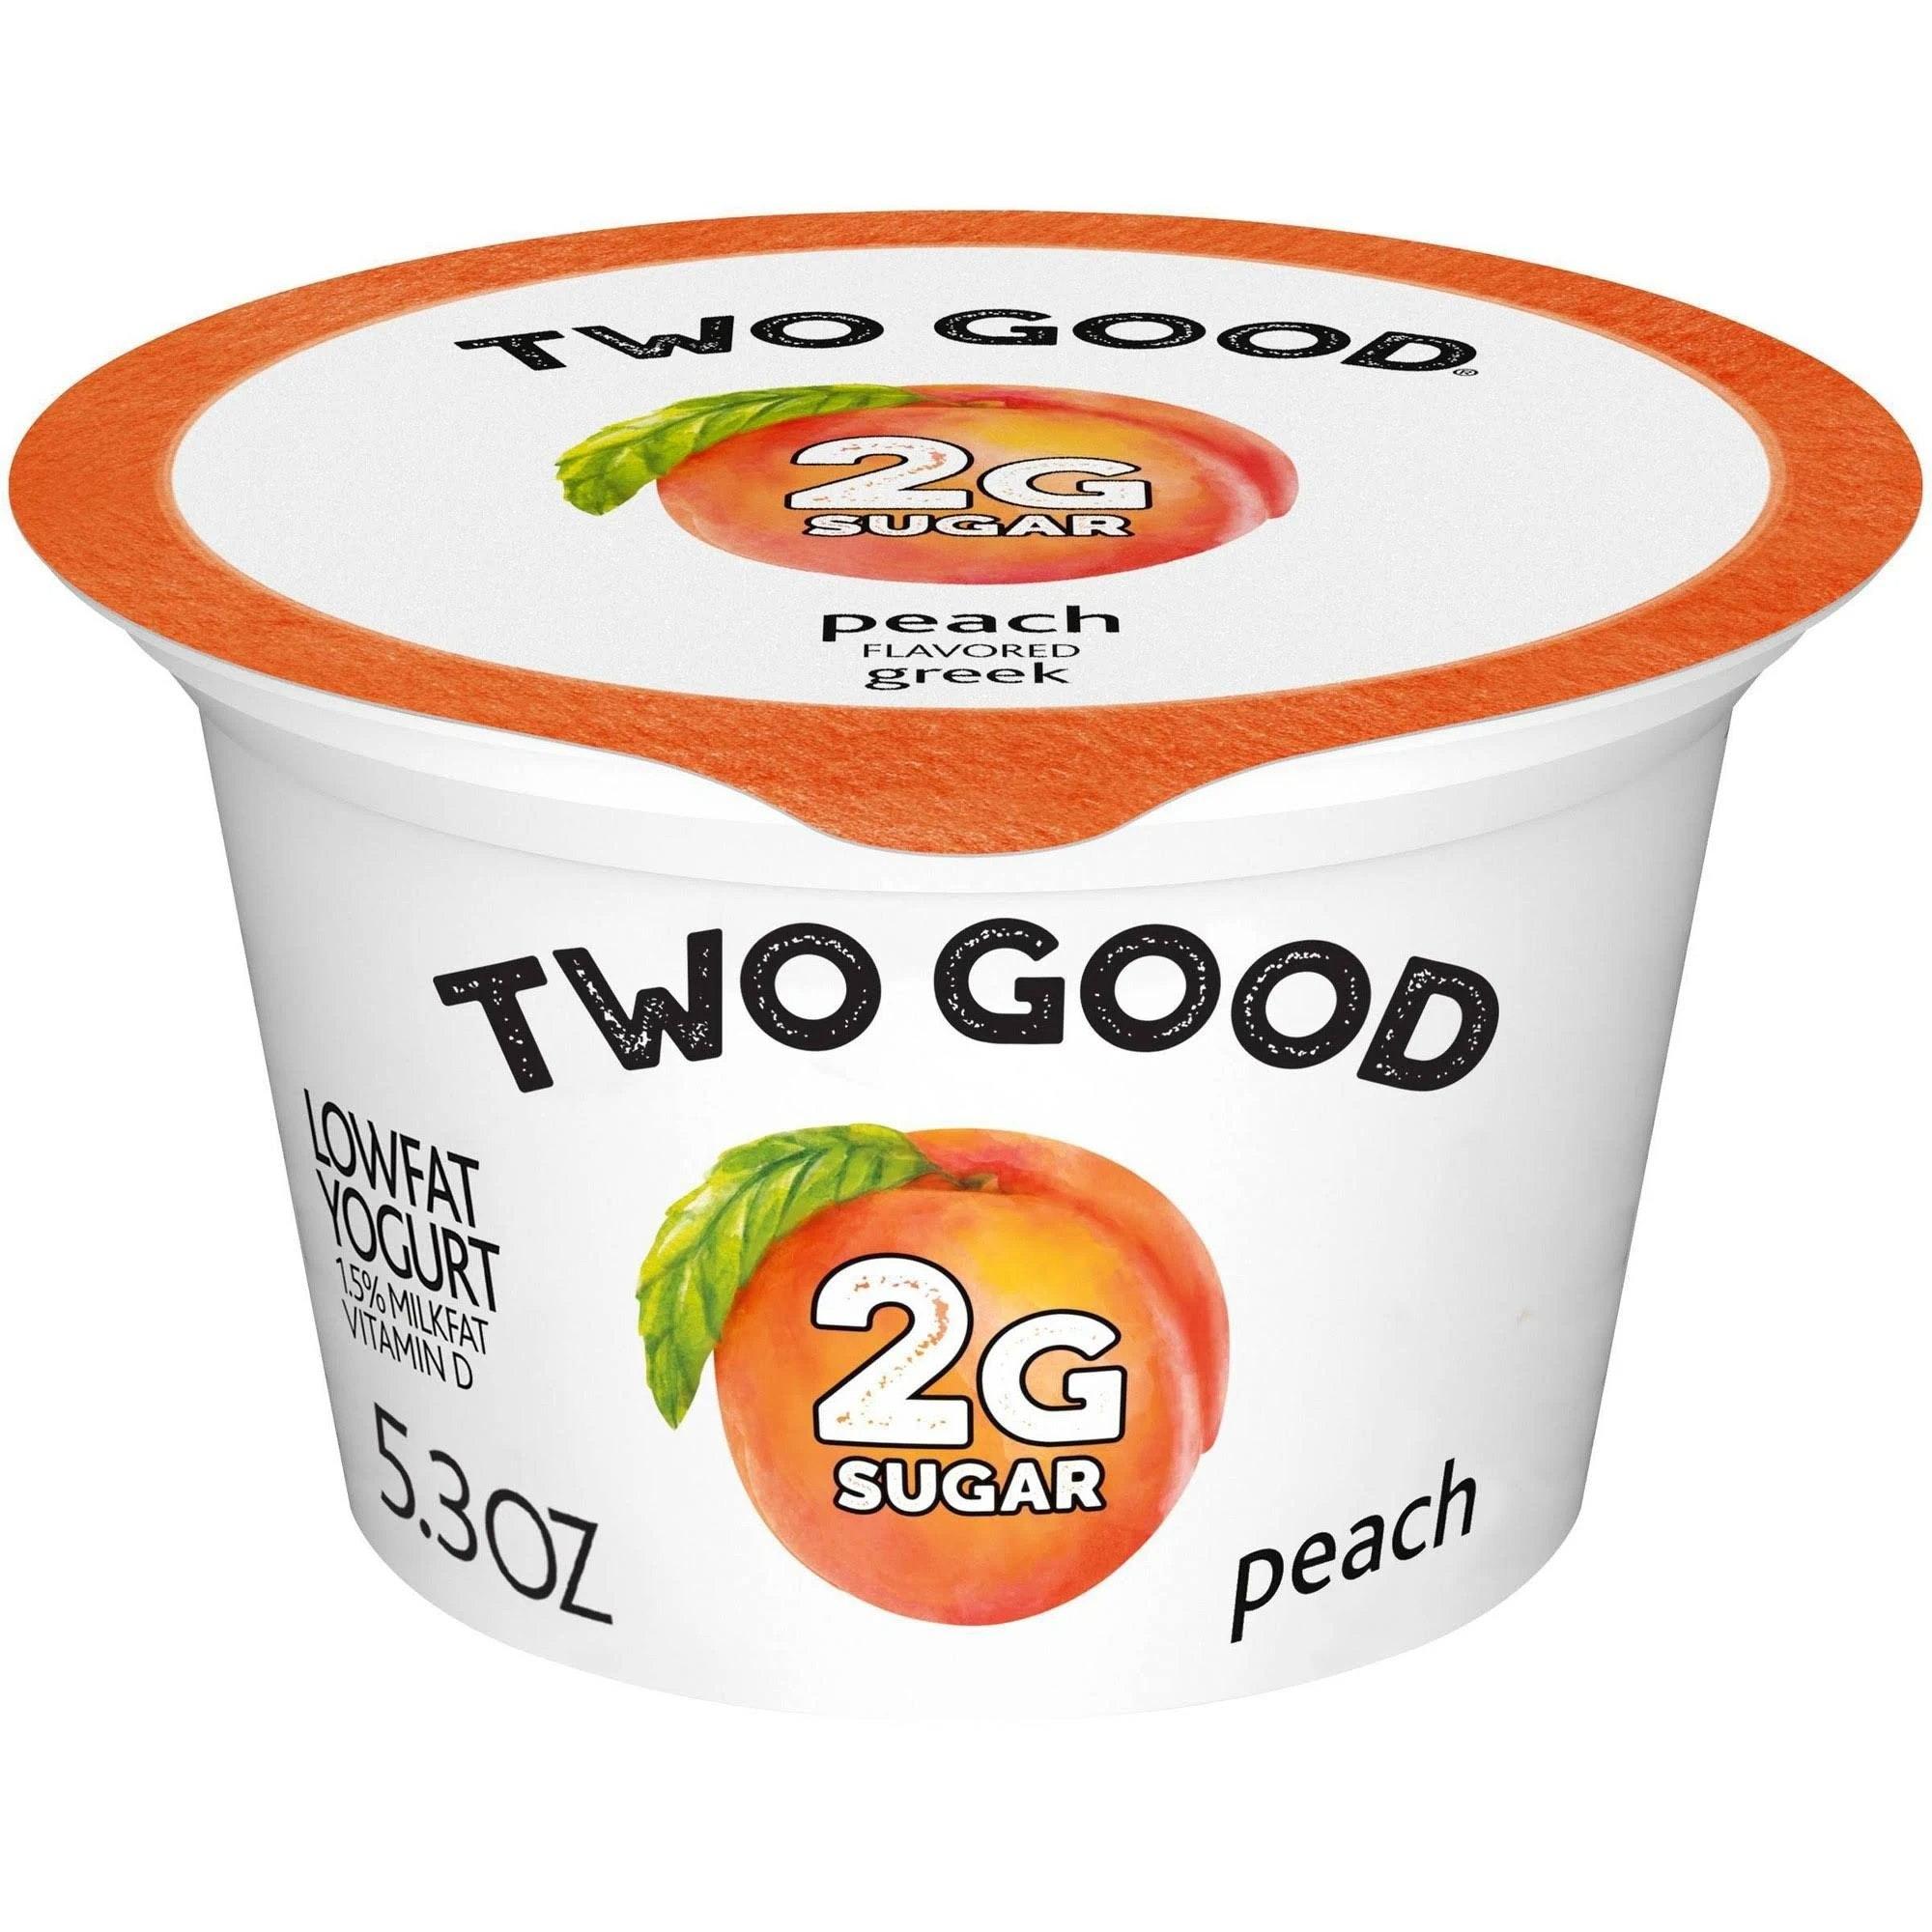 Two Good Yogurt